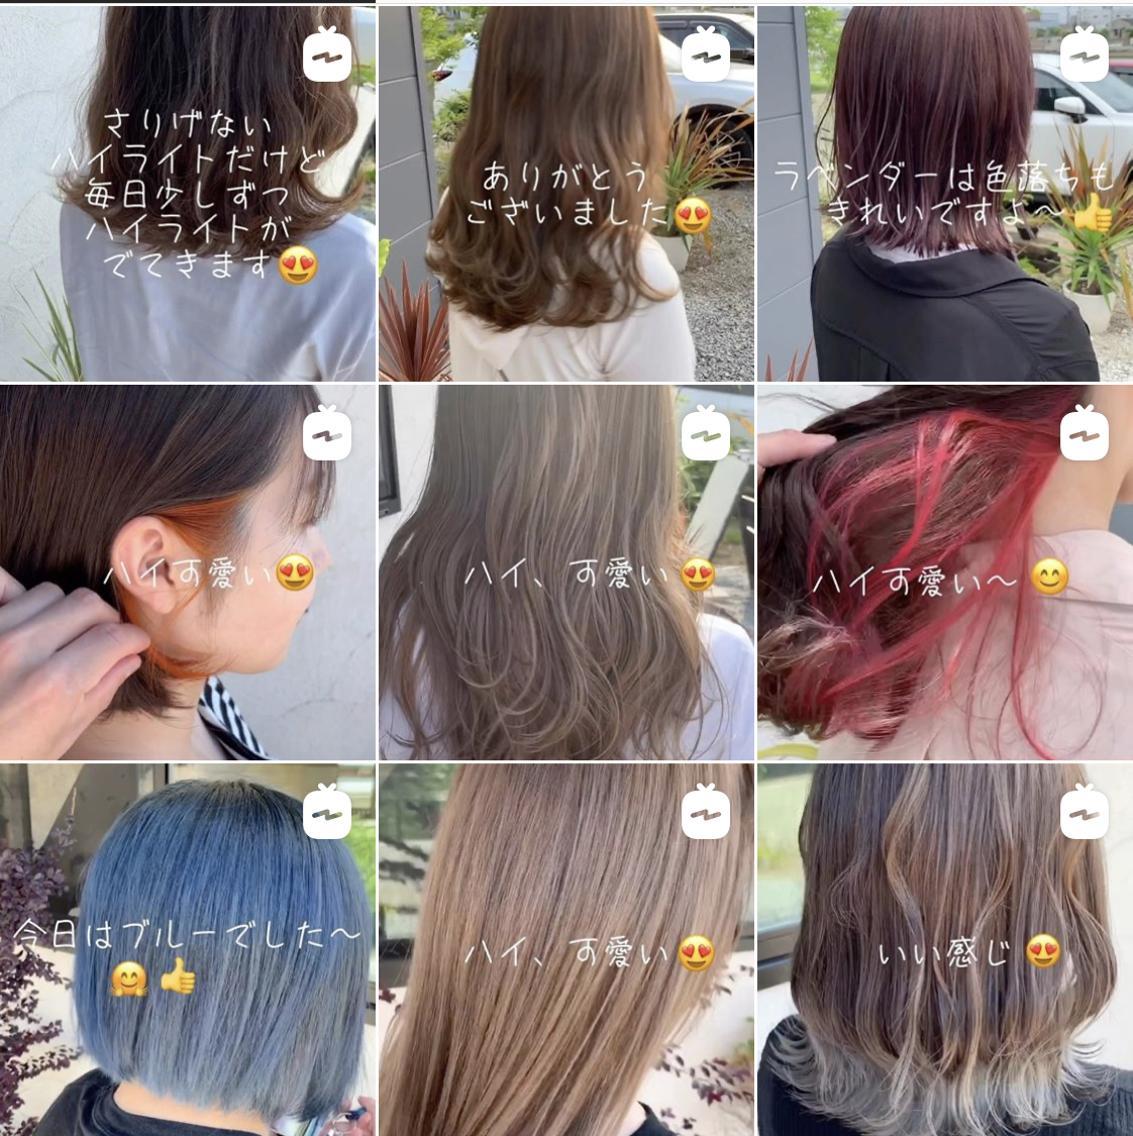 hair atelieremma所属・倉橋 渉の掲載